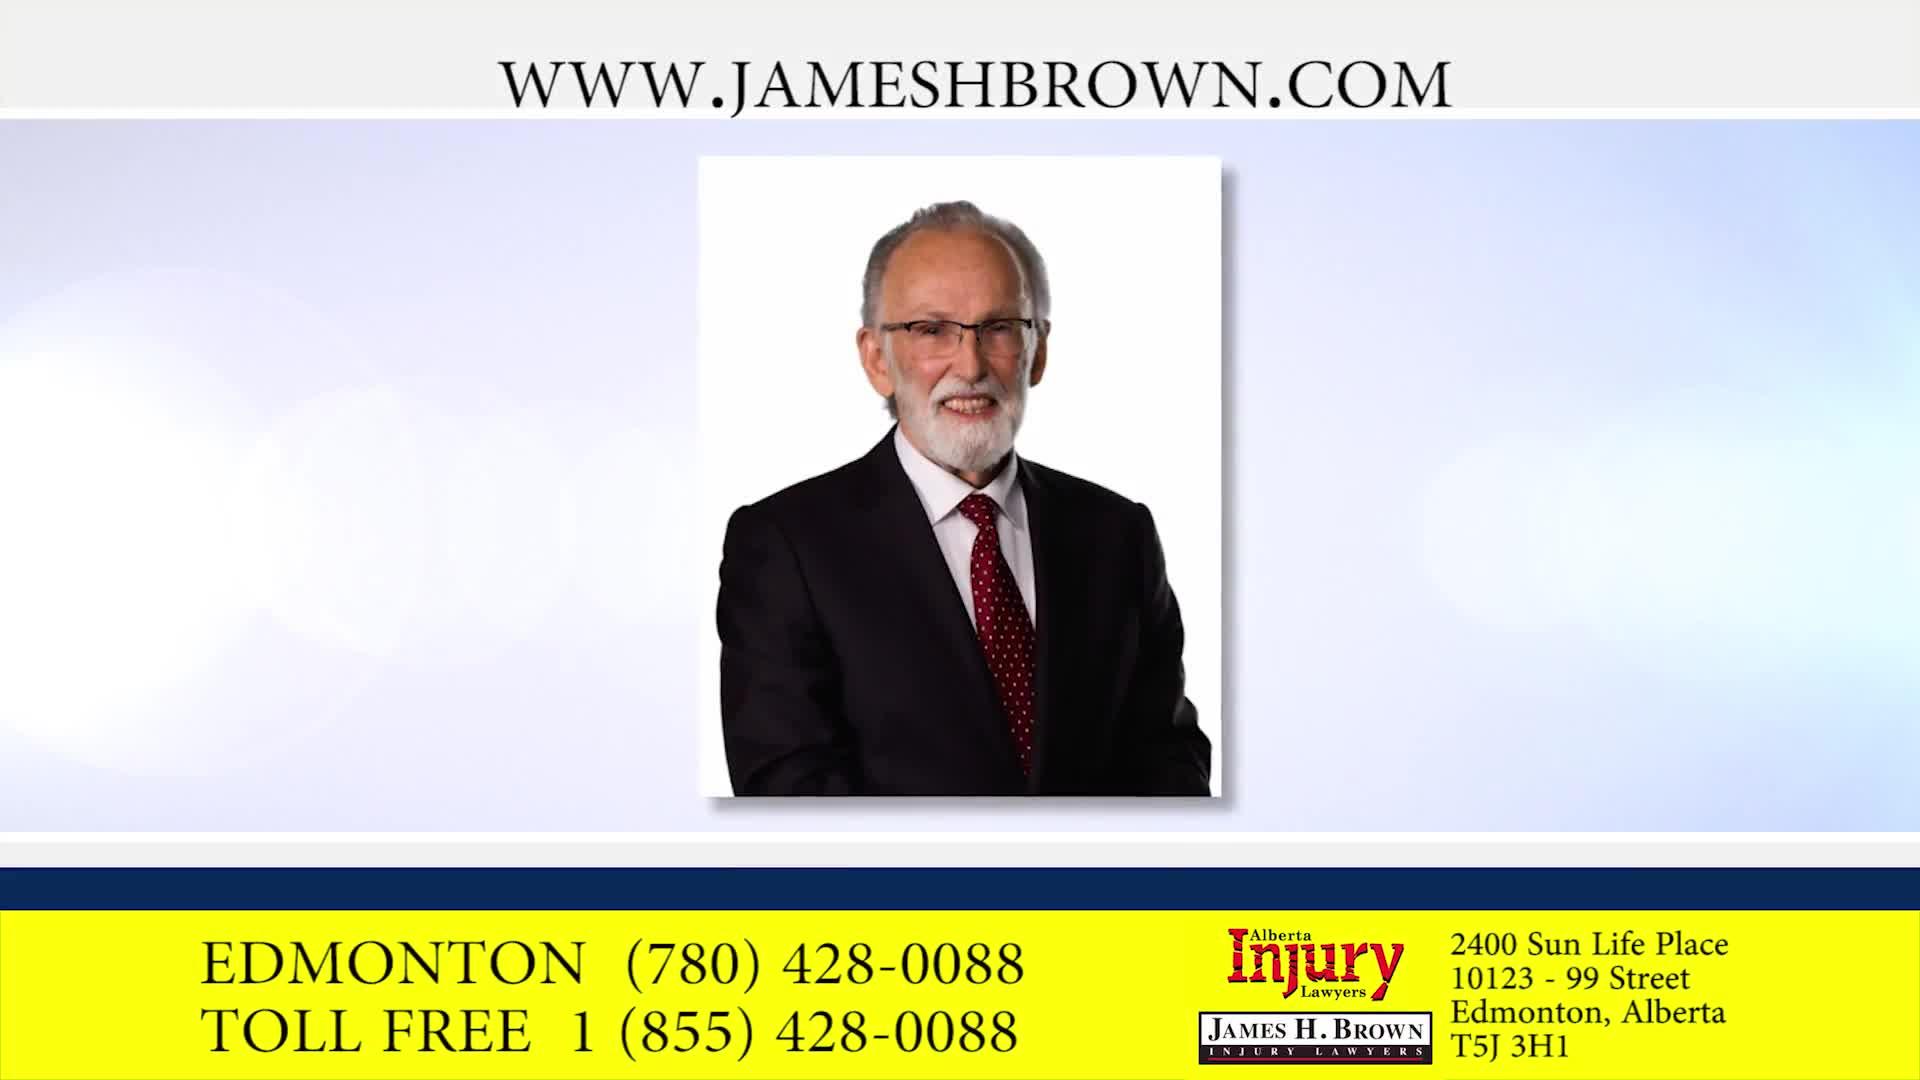 View James H Brown's Edmonton profile